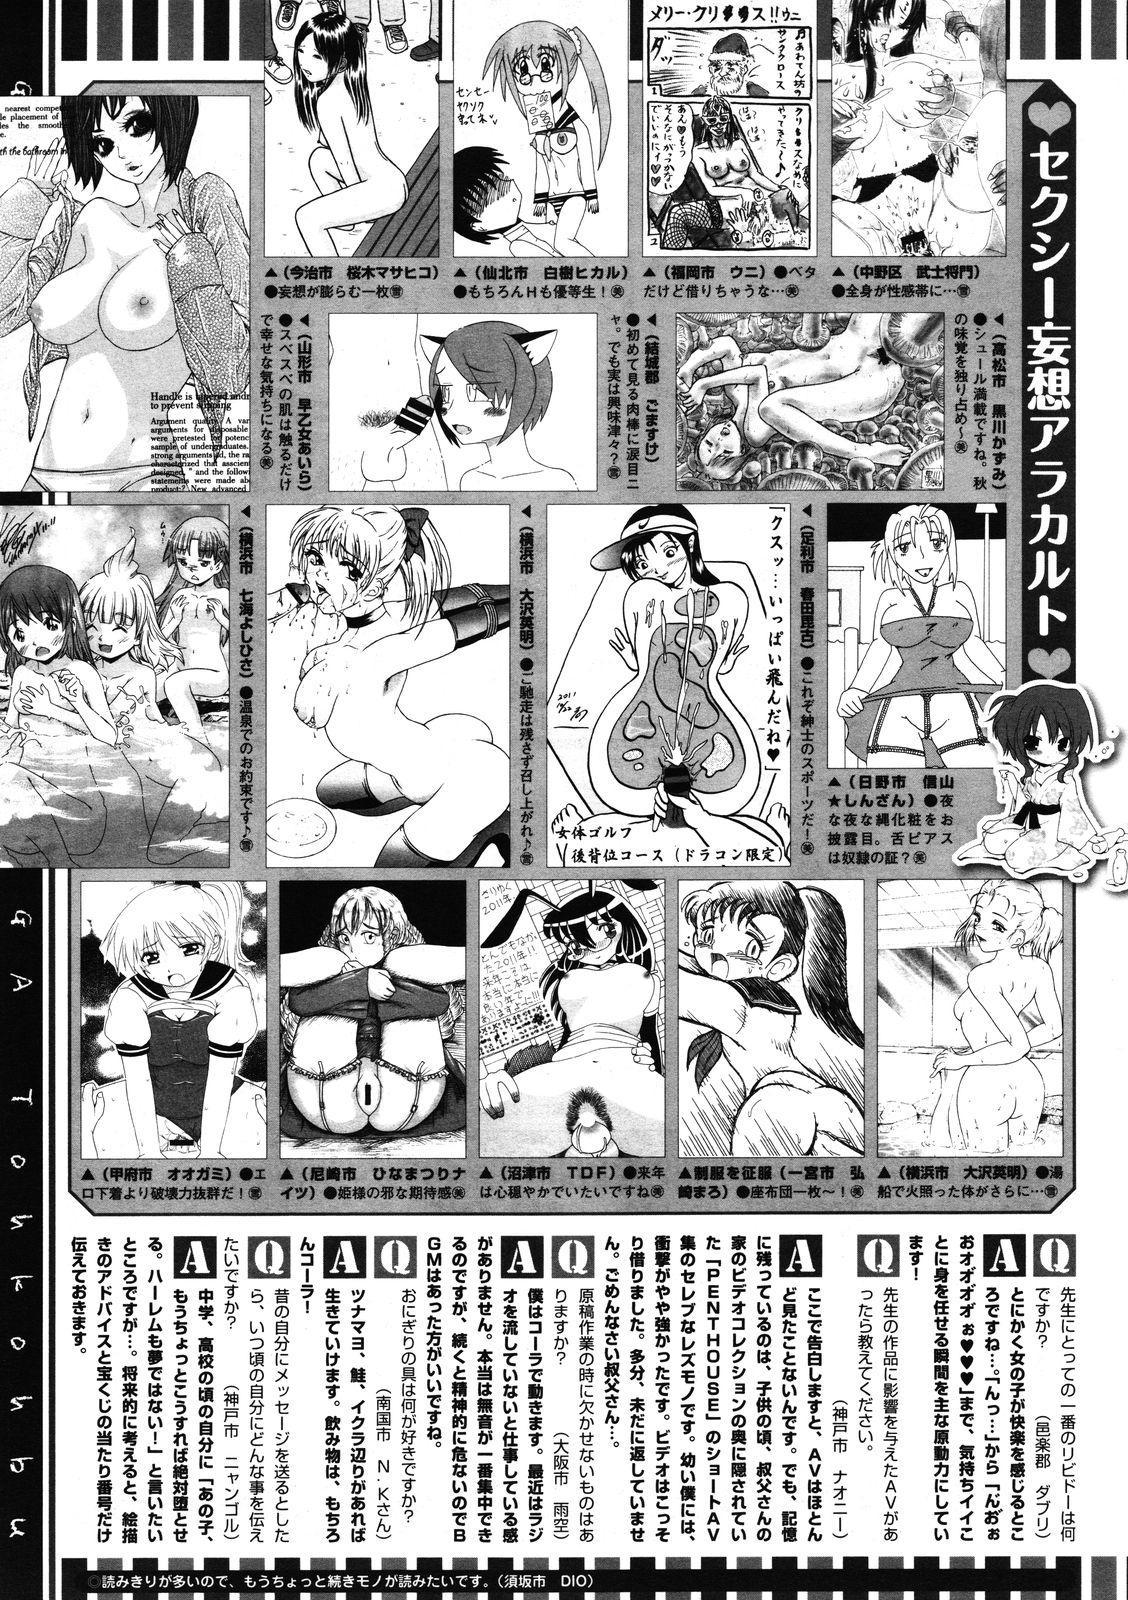 COMIC Megastore 2012-01 508